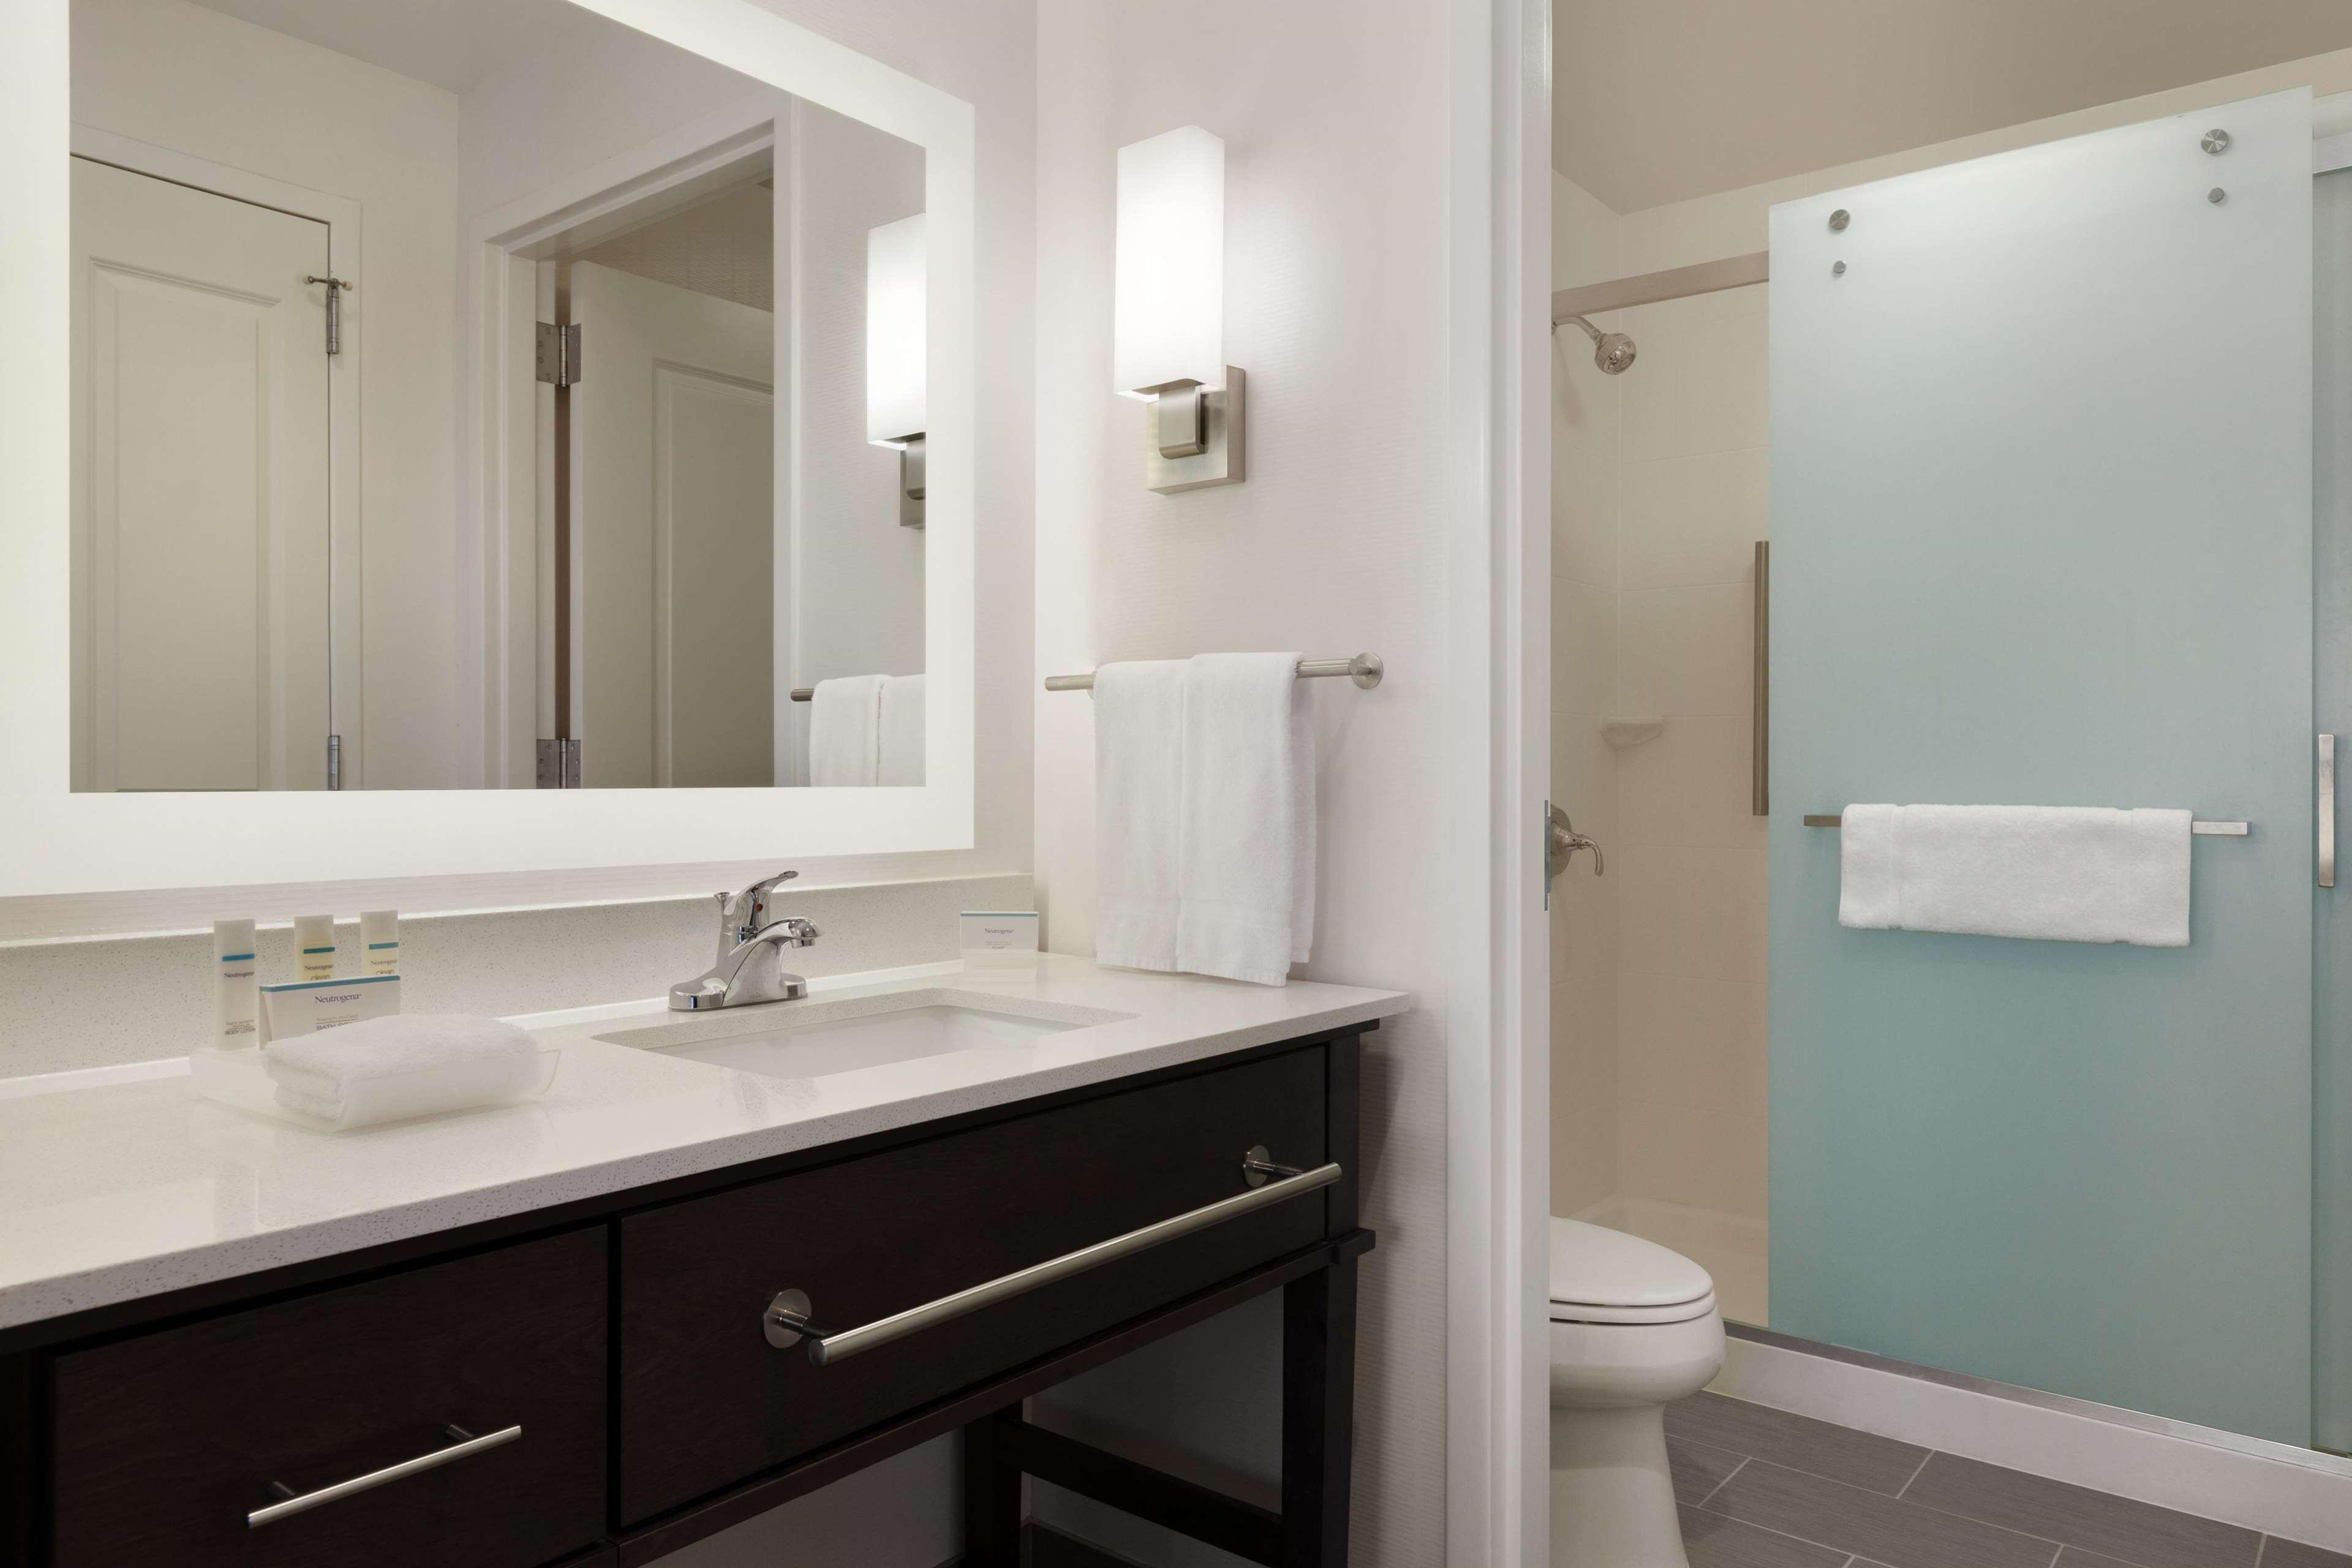 Homewood Suites by Hilton Charlotte/SouthPark image 7